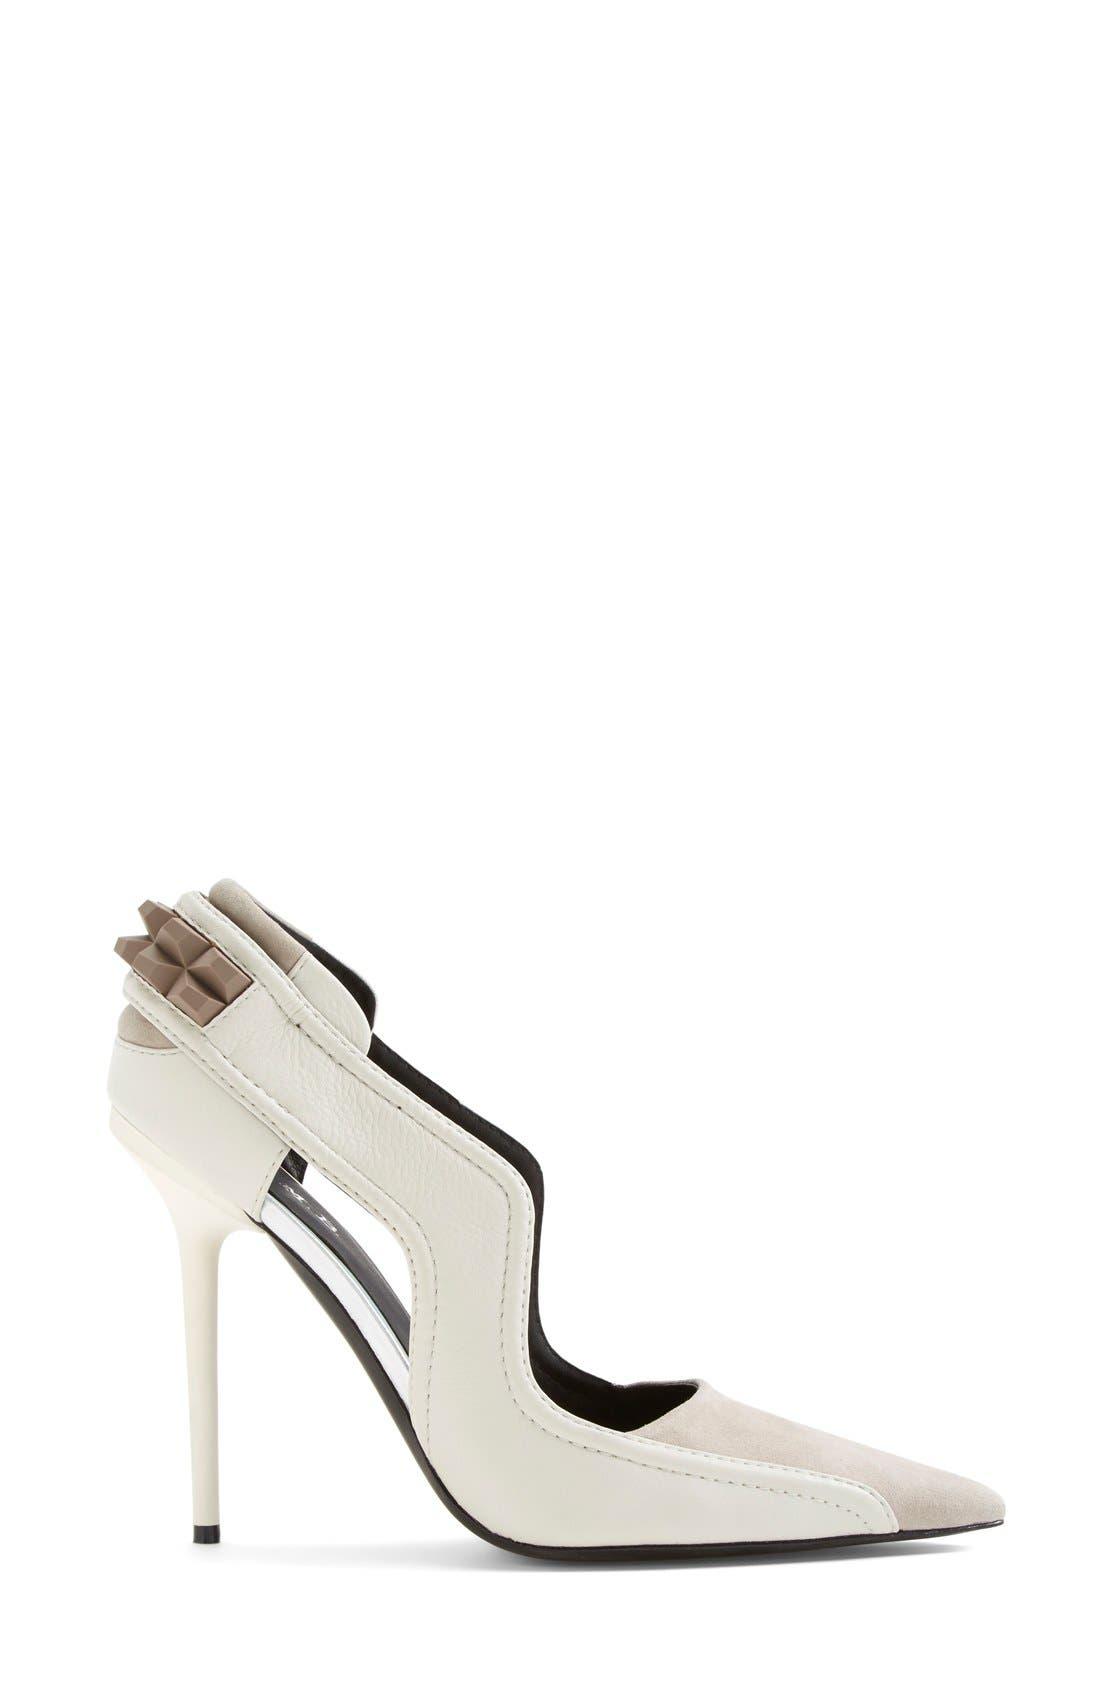 Alternate Image 4  - L.A.M.B. 'Enforce' Leather & Suede Pointy Toe Pump (Women)